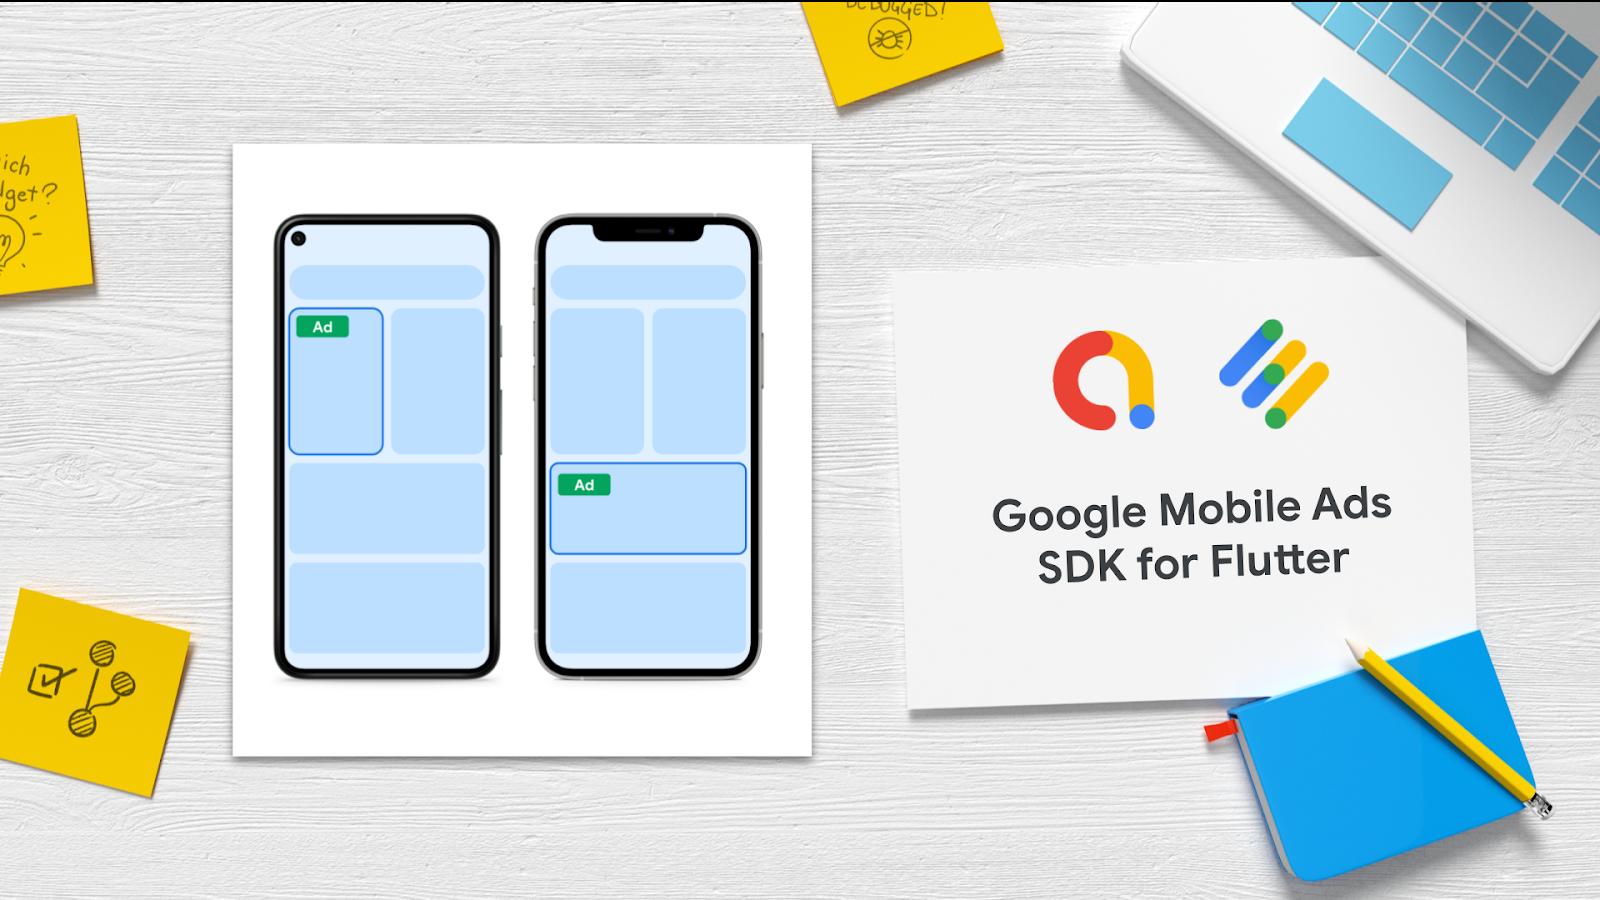 Google Mobile Ads SDK for Flutter